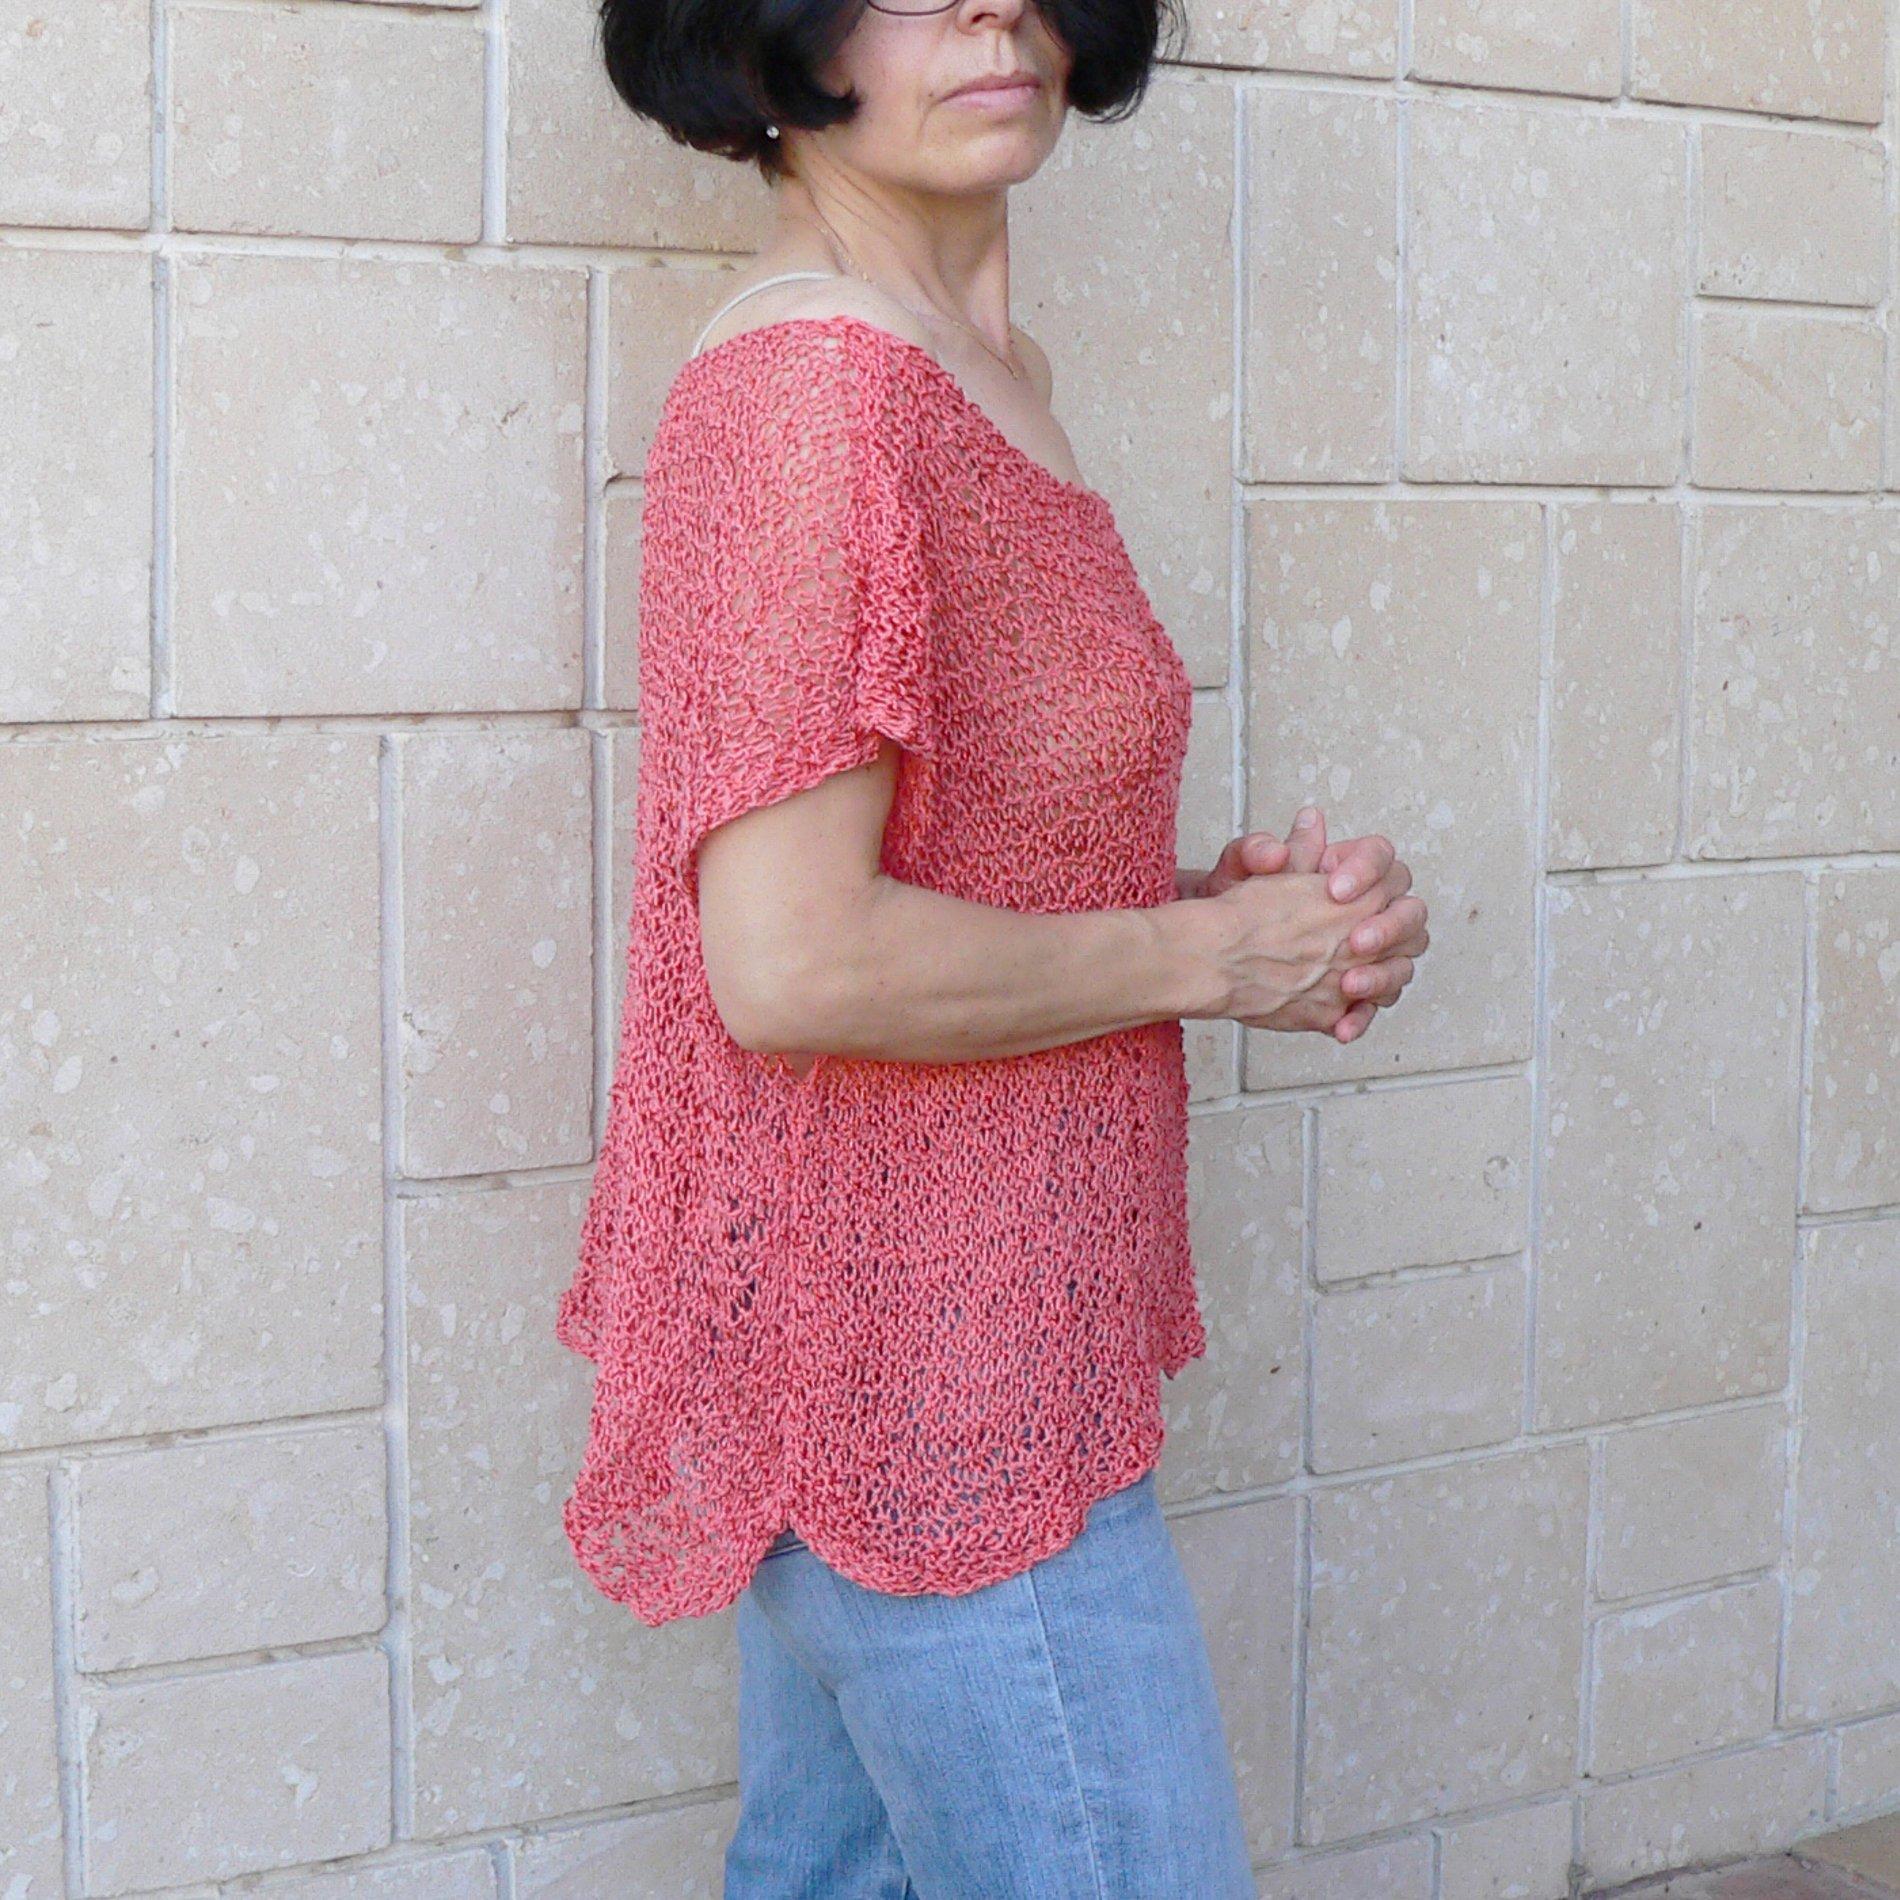 Woman cotton top #046F